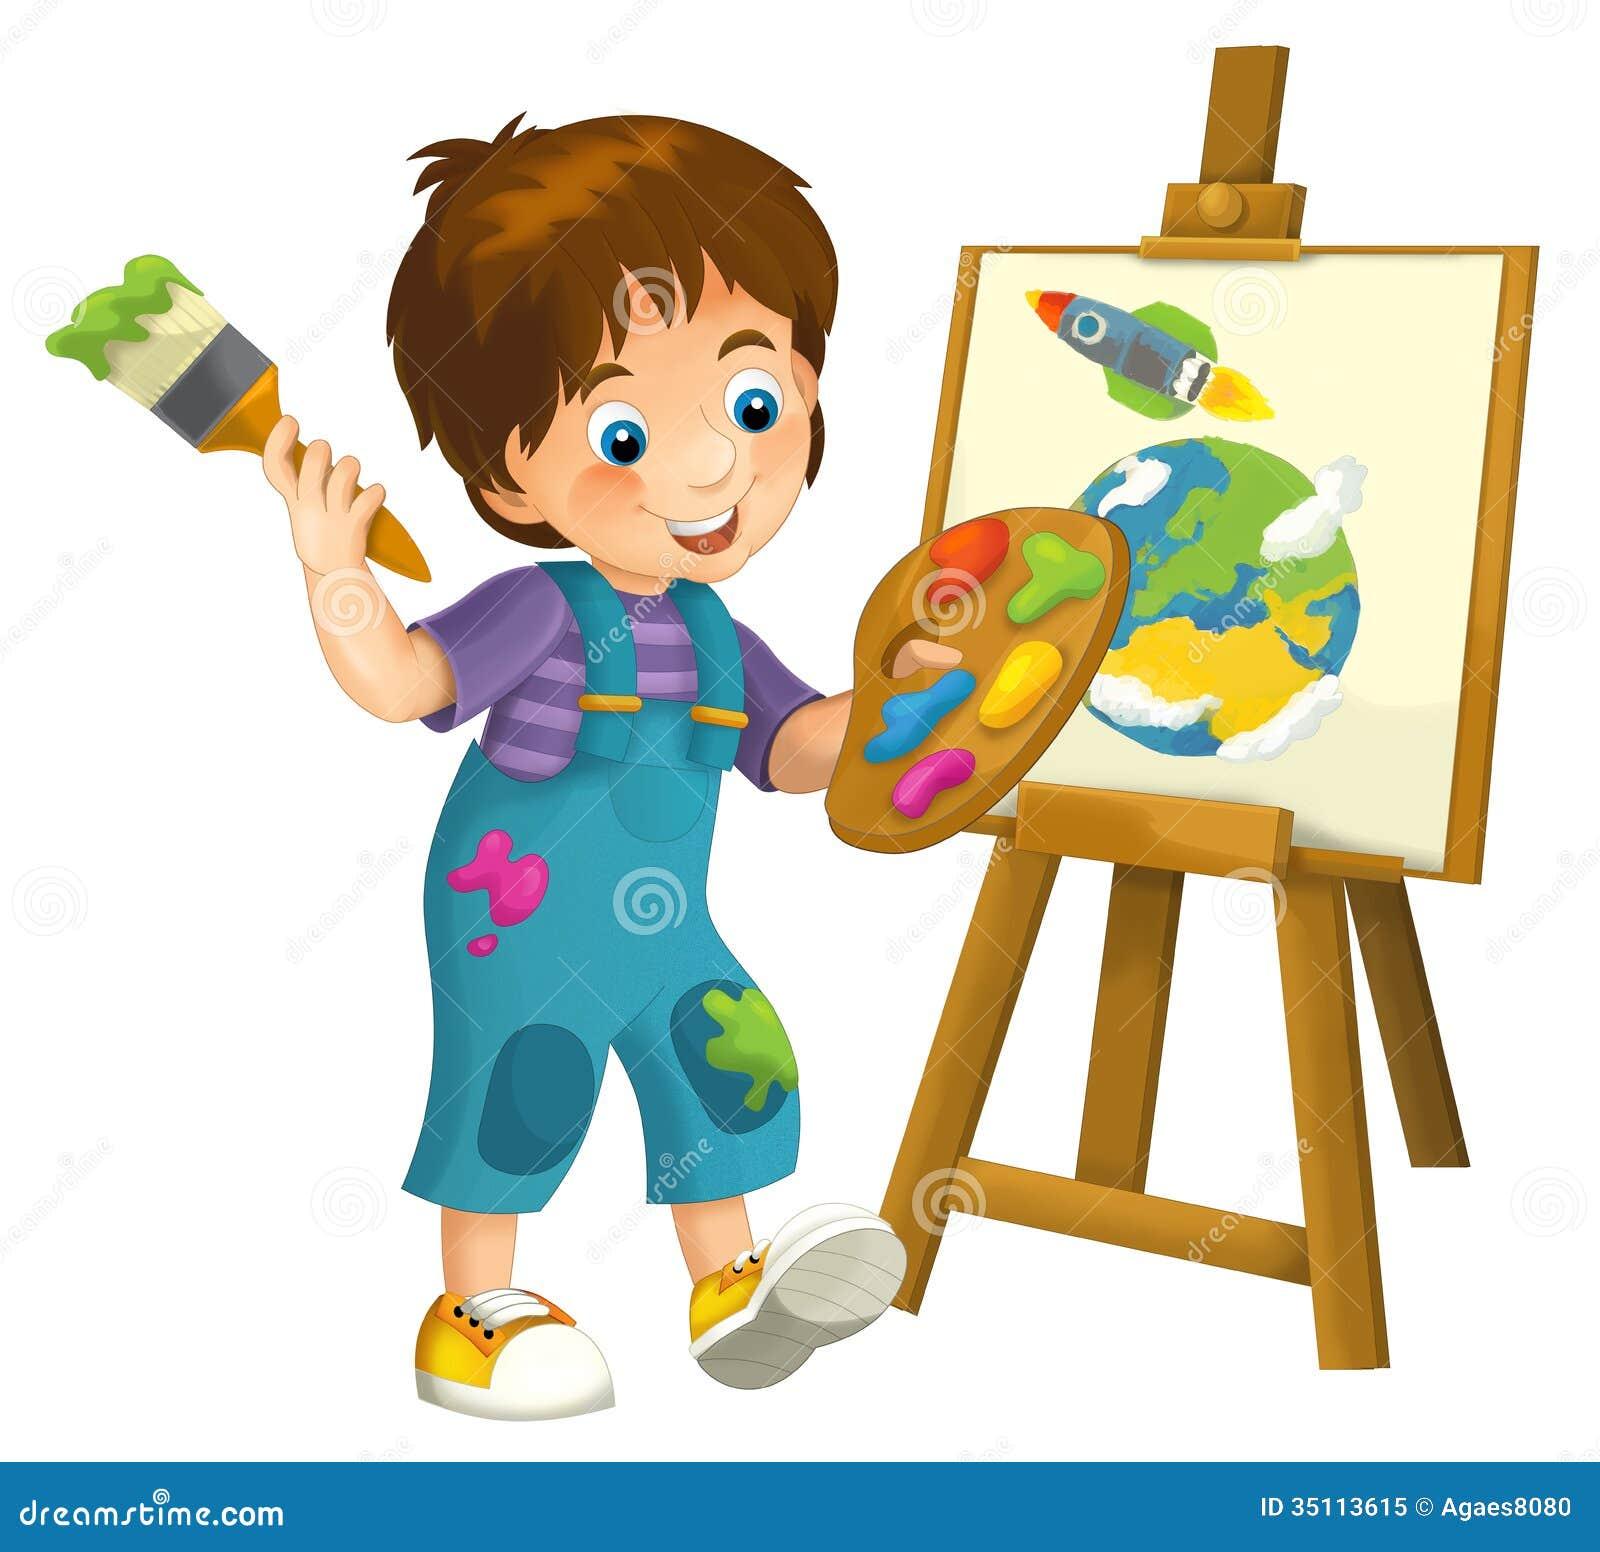 Cartoon Child - Illustration For The Children Royalty Free Stock Photo ...